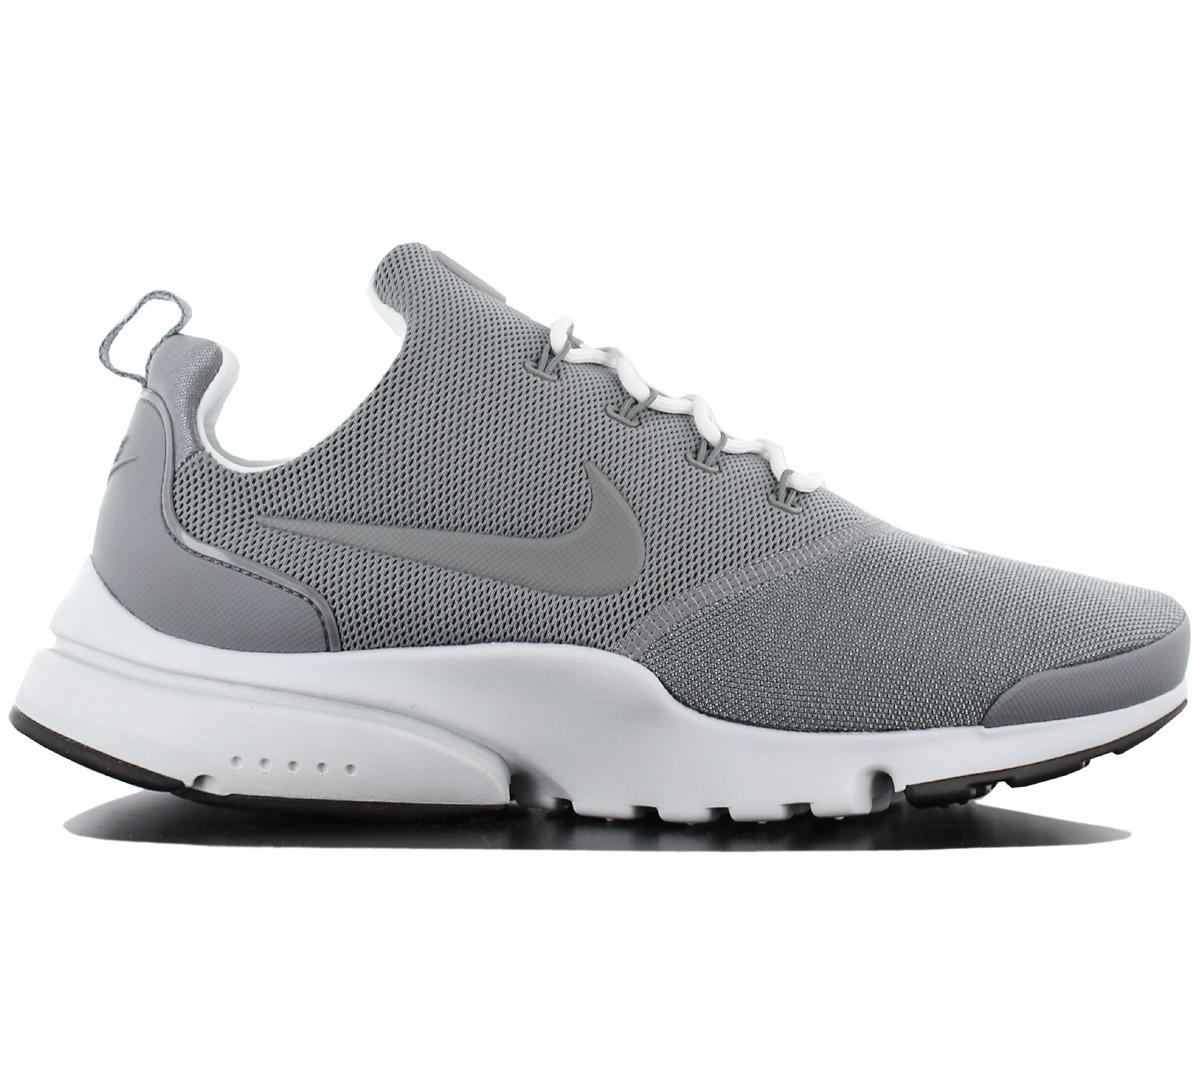 Nike Formateurs Mouche Presto Gris 908019-012 - Gris uWc5yV4SM9